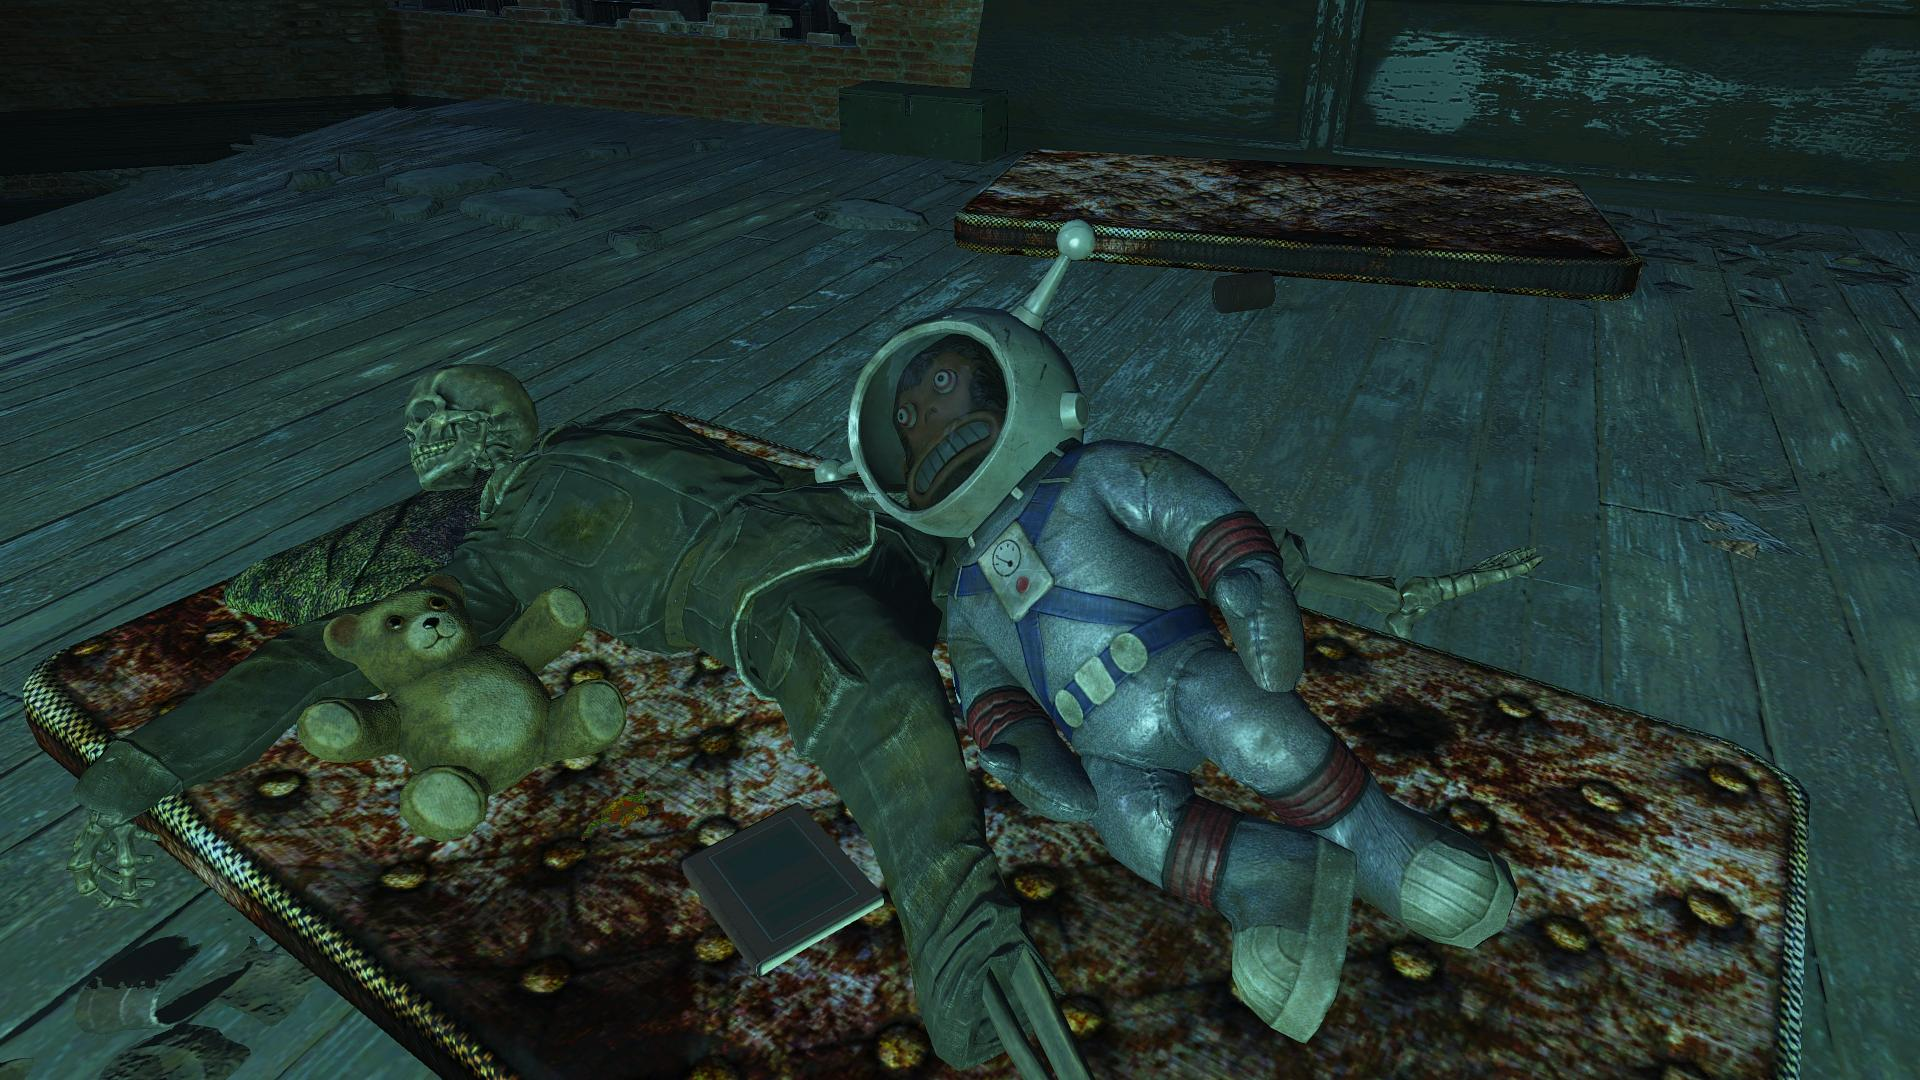 000168.Jpg - Fallout 4